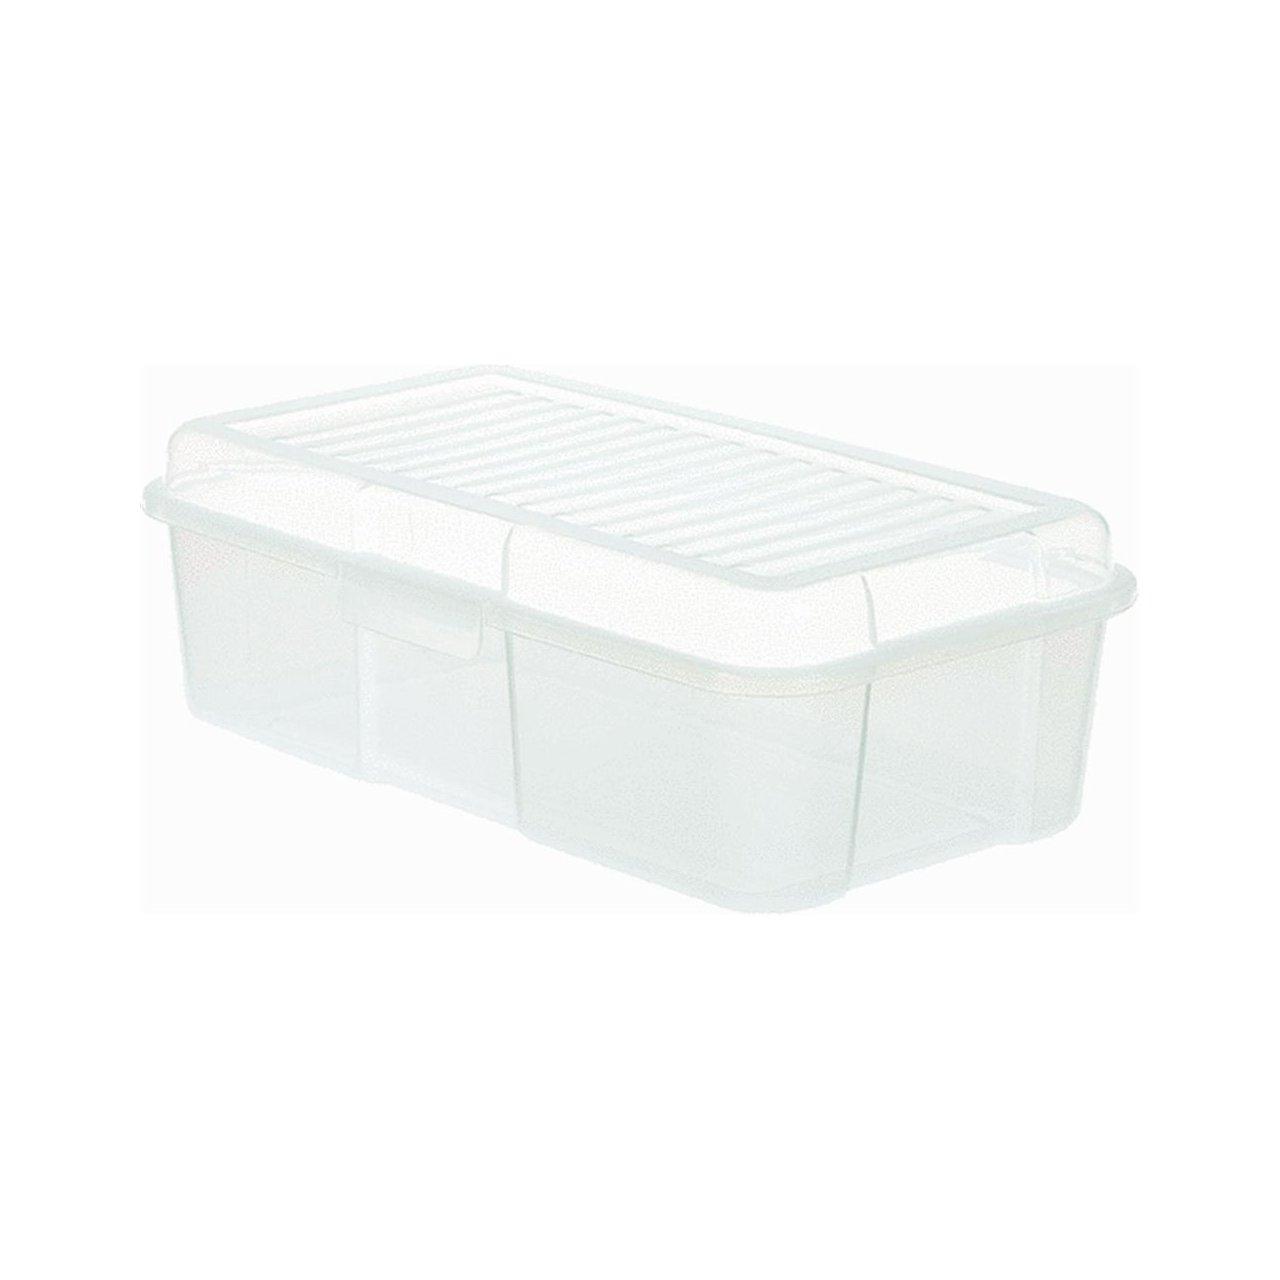 Rubbermaid Home 228100-CLR Snap Case Storage Tote Rubbermaid Brute 2281-00-CLR RUBFG22810FCLR